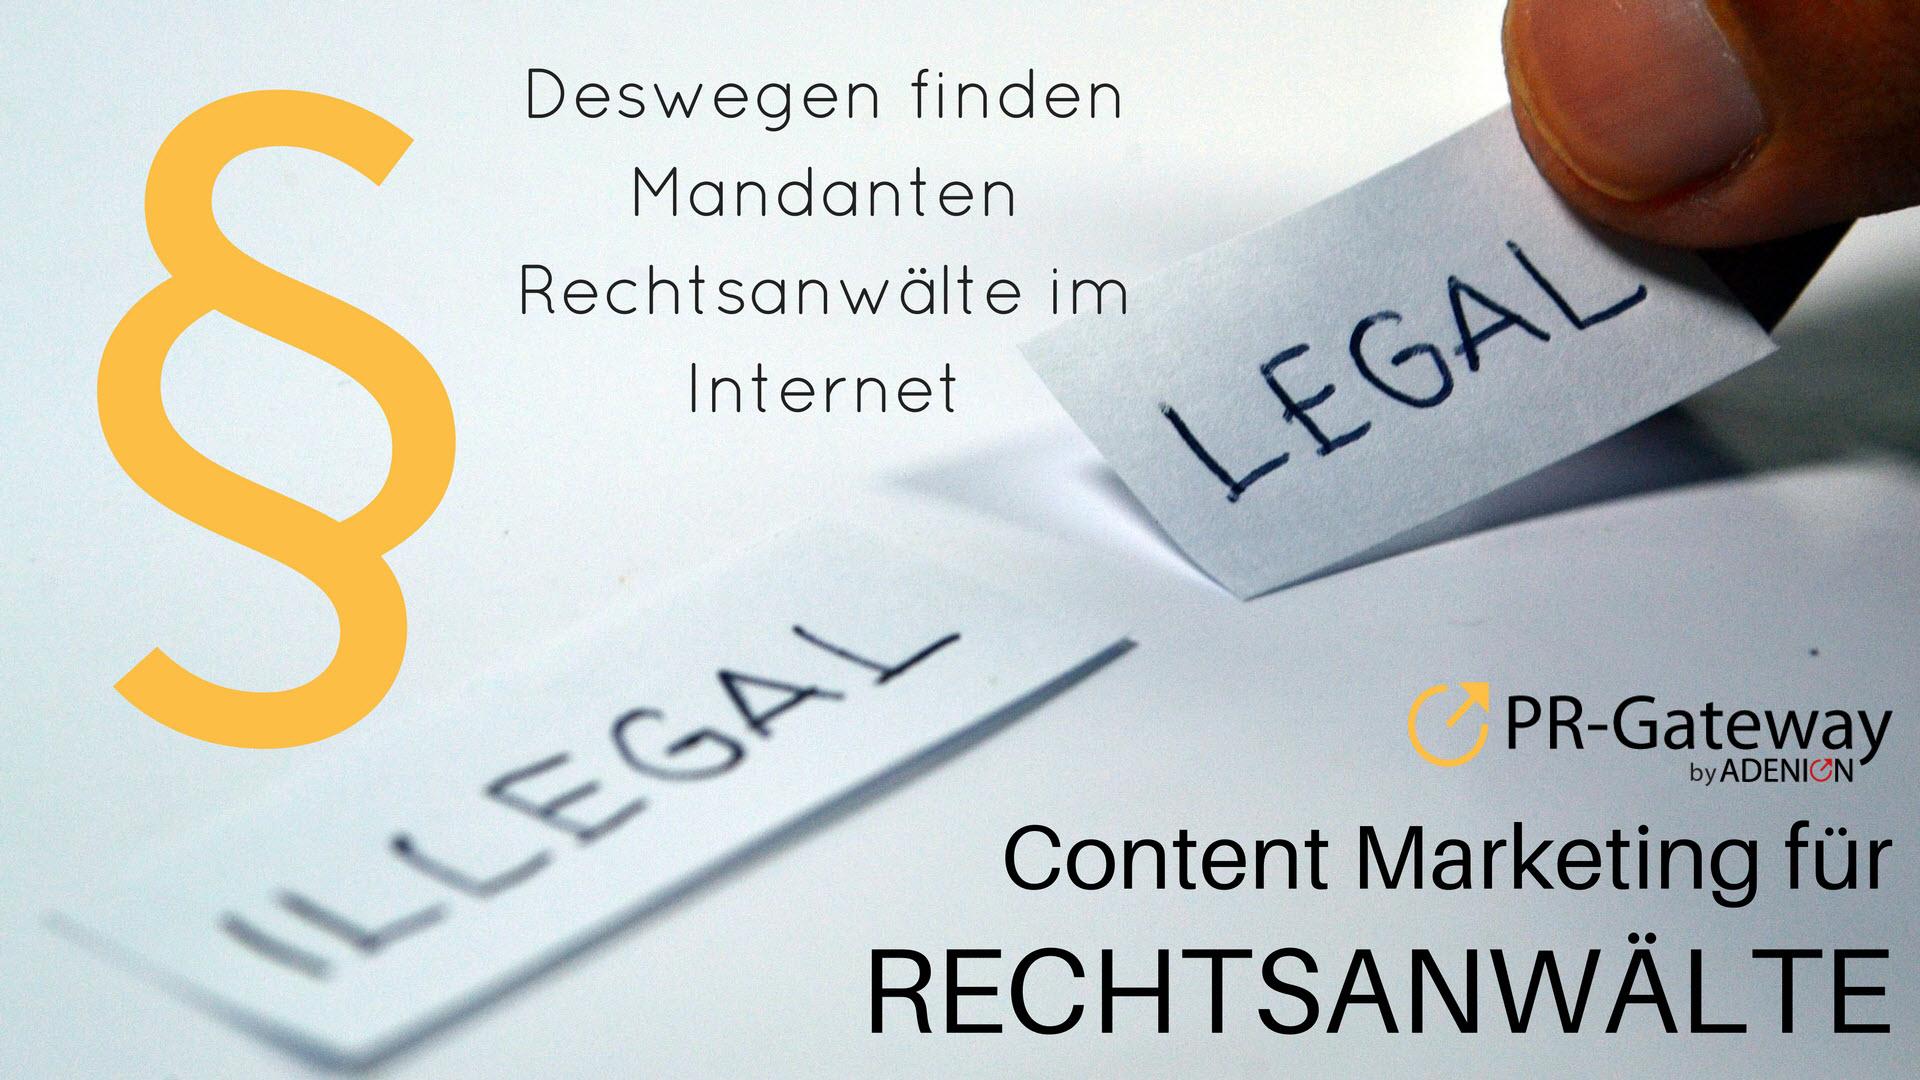 Cover zu Deswegen finden Mandanten Rechtsanwälte im Internet